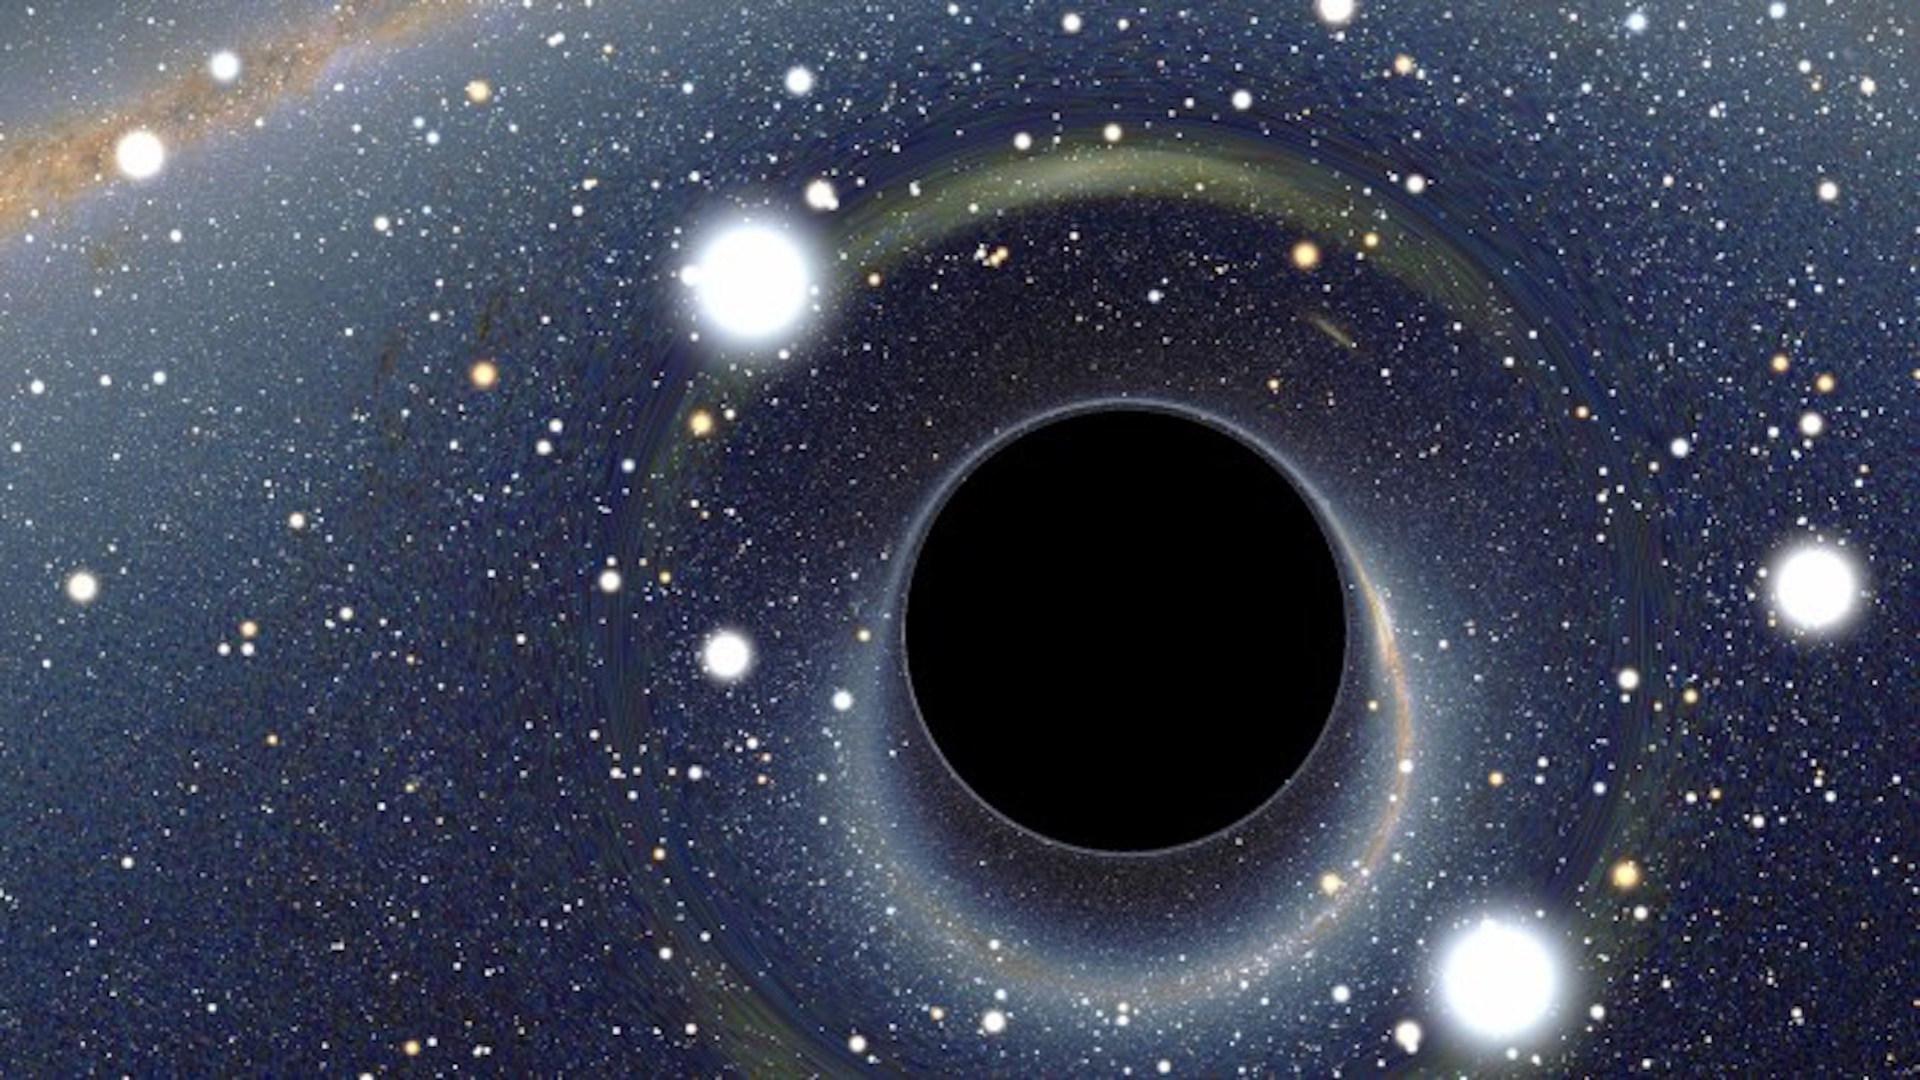 Weltraum, Sterne, Schwarzes Loch, blackhole